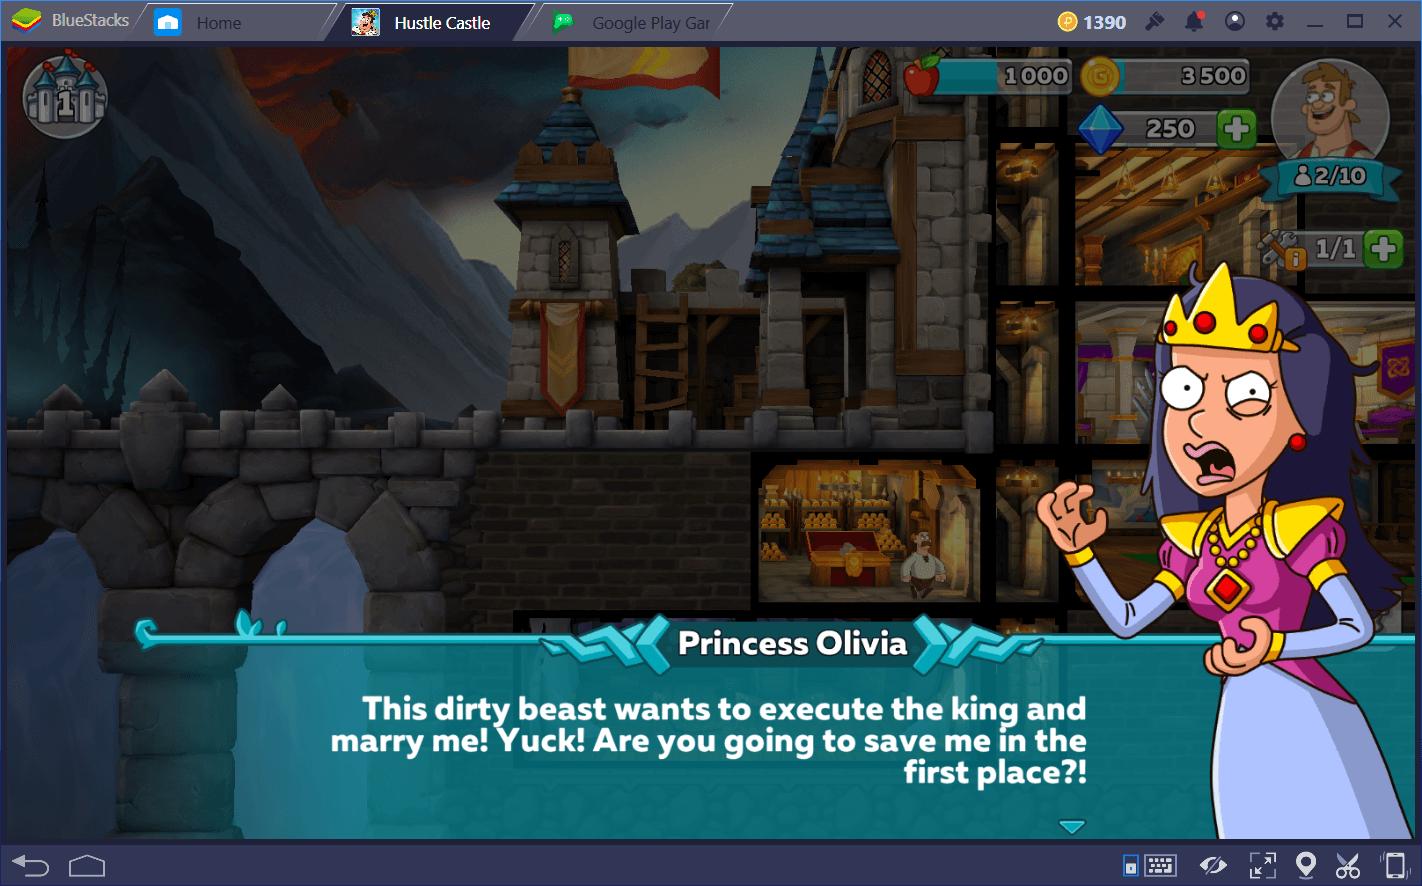 Hustle Castle: Fantasy Kingdom Beginner's Guide